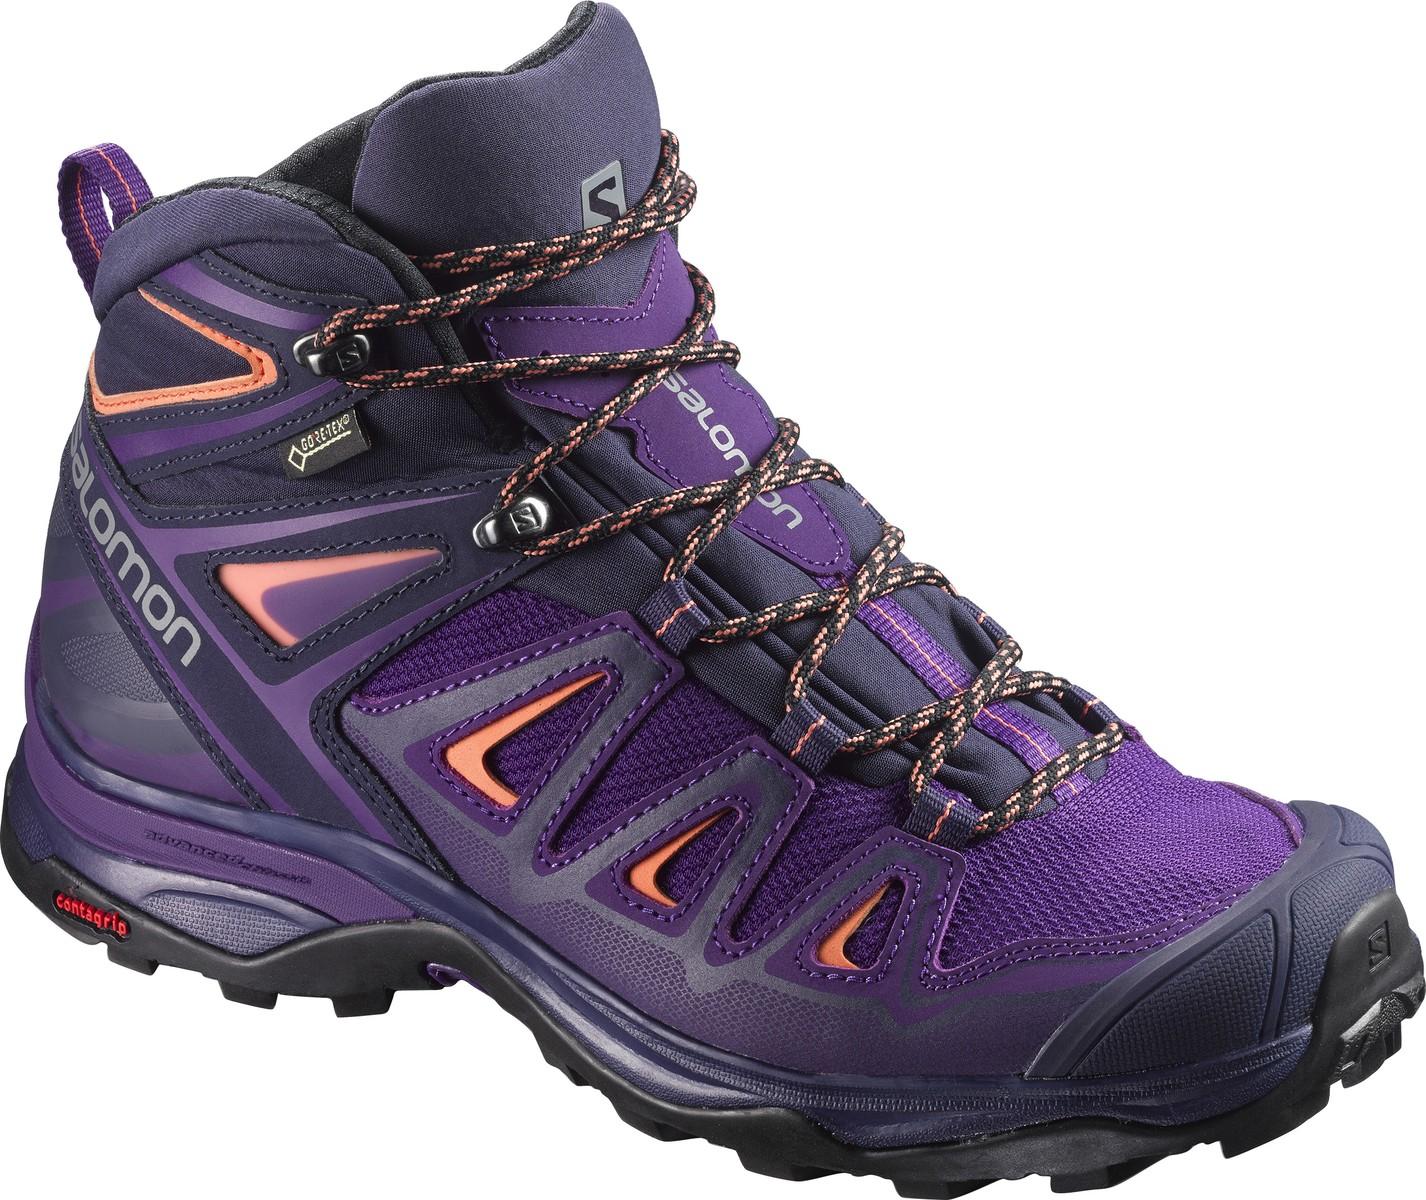 Salomon X Ultra 3 Mid GTX® W - Chaussures randonnée femme